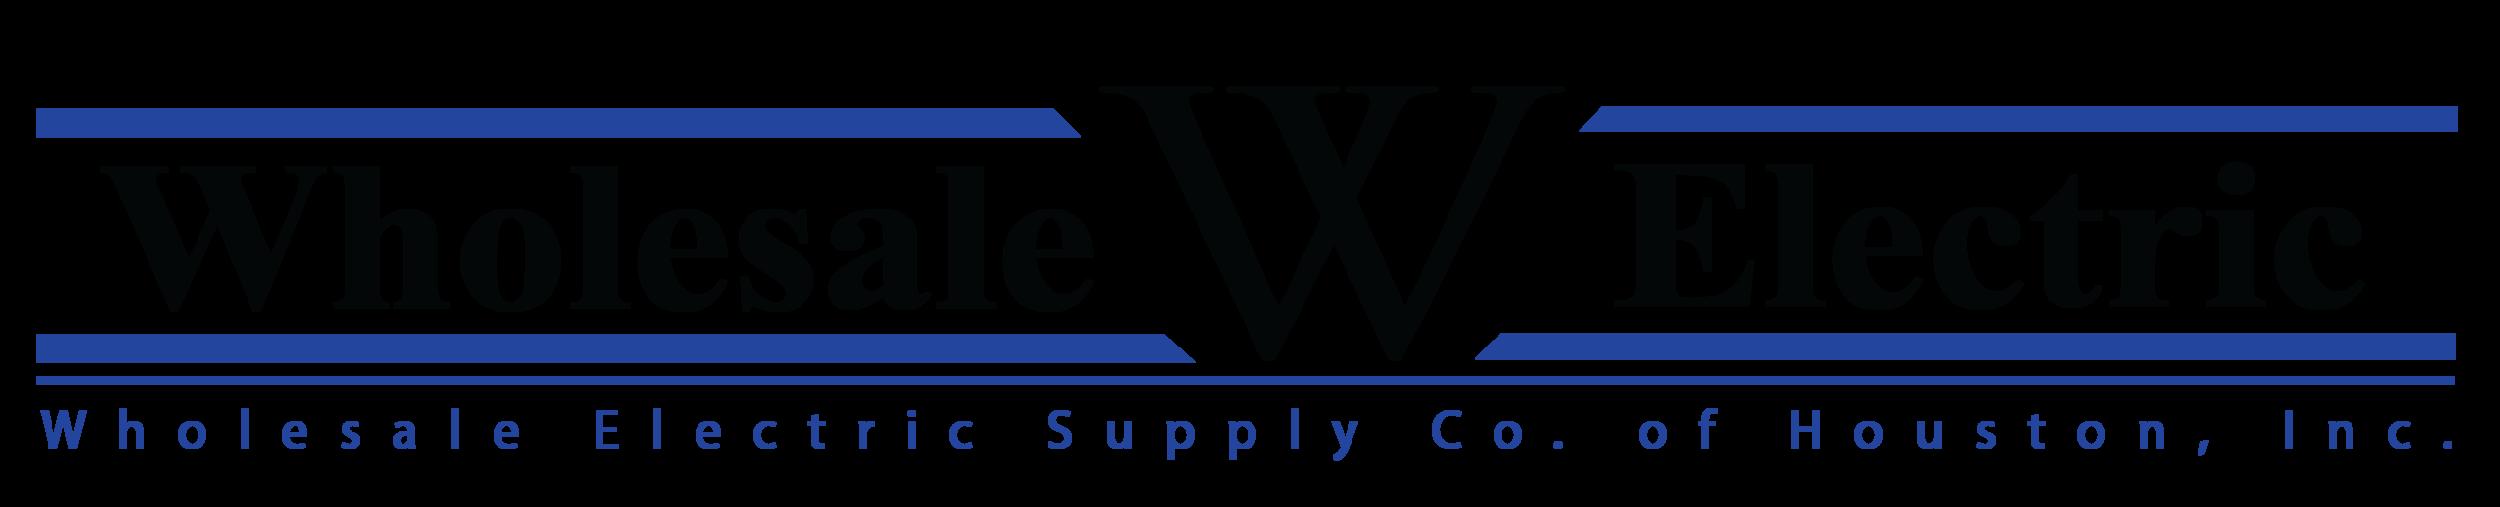 WES-Full-Name-Logo.png